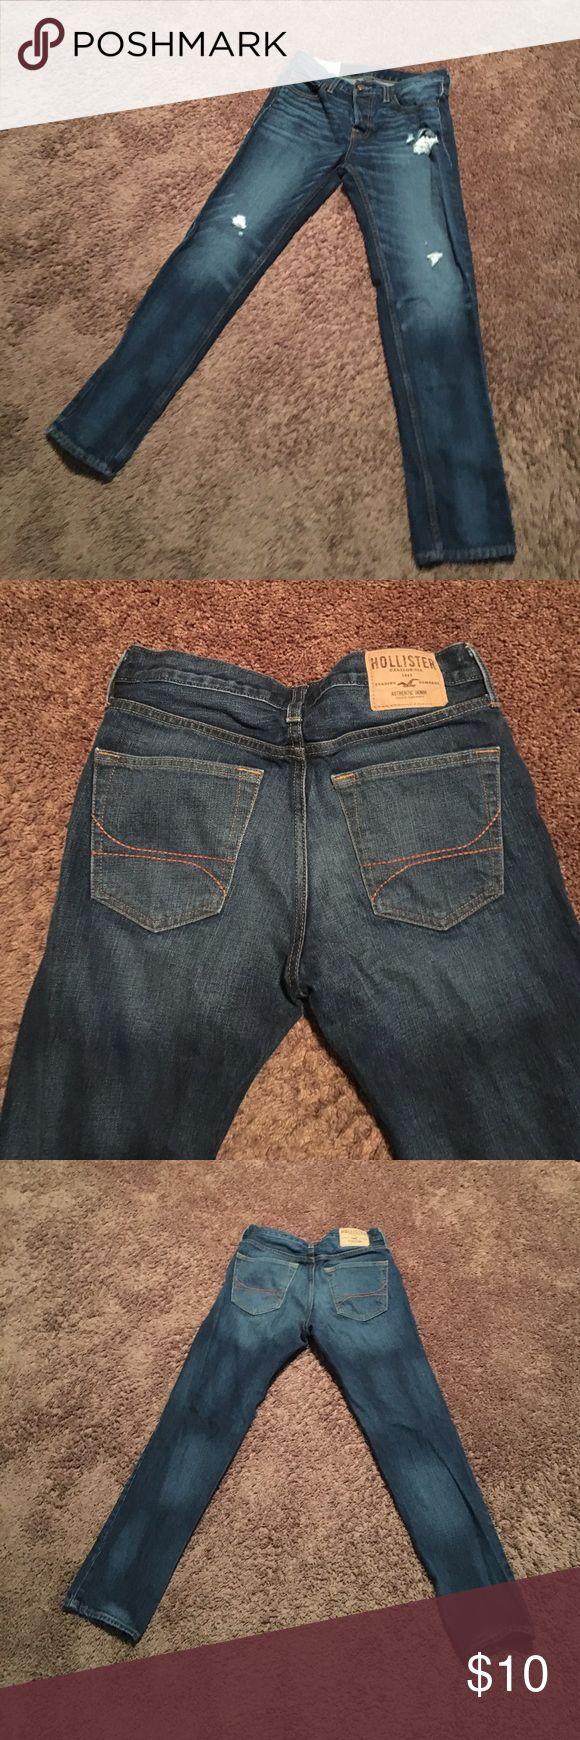 17 Best ideas about Ripped Jeans Men on Pinterest | Man ...